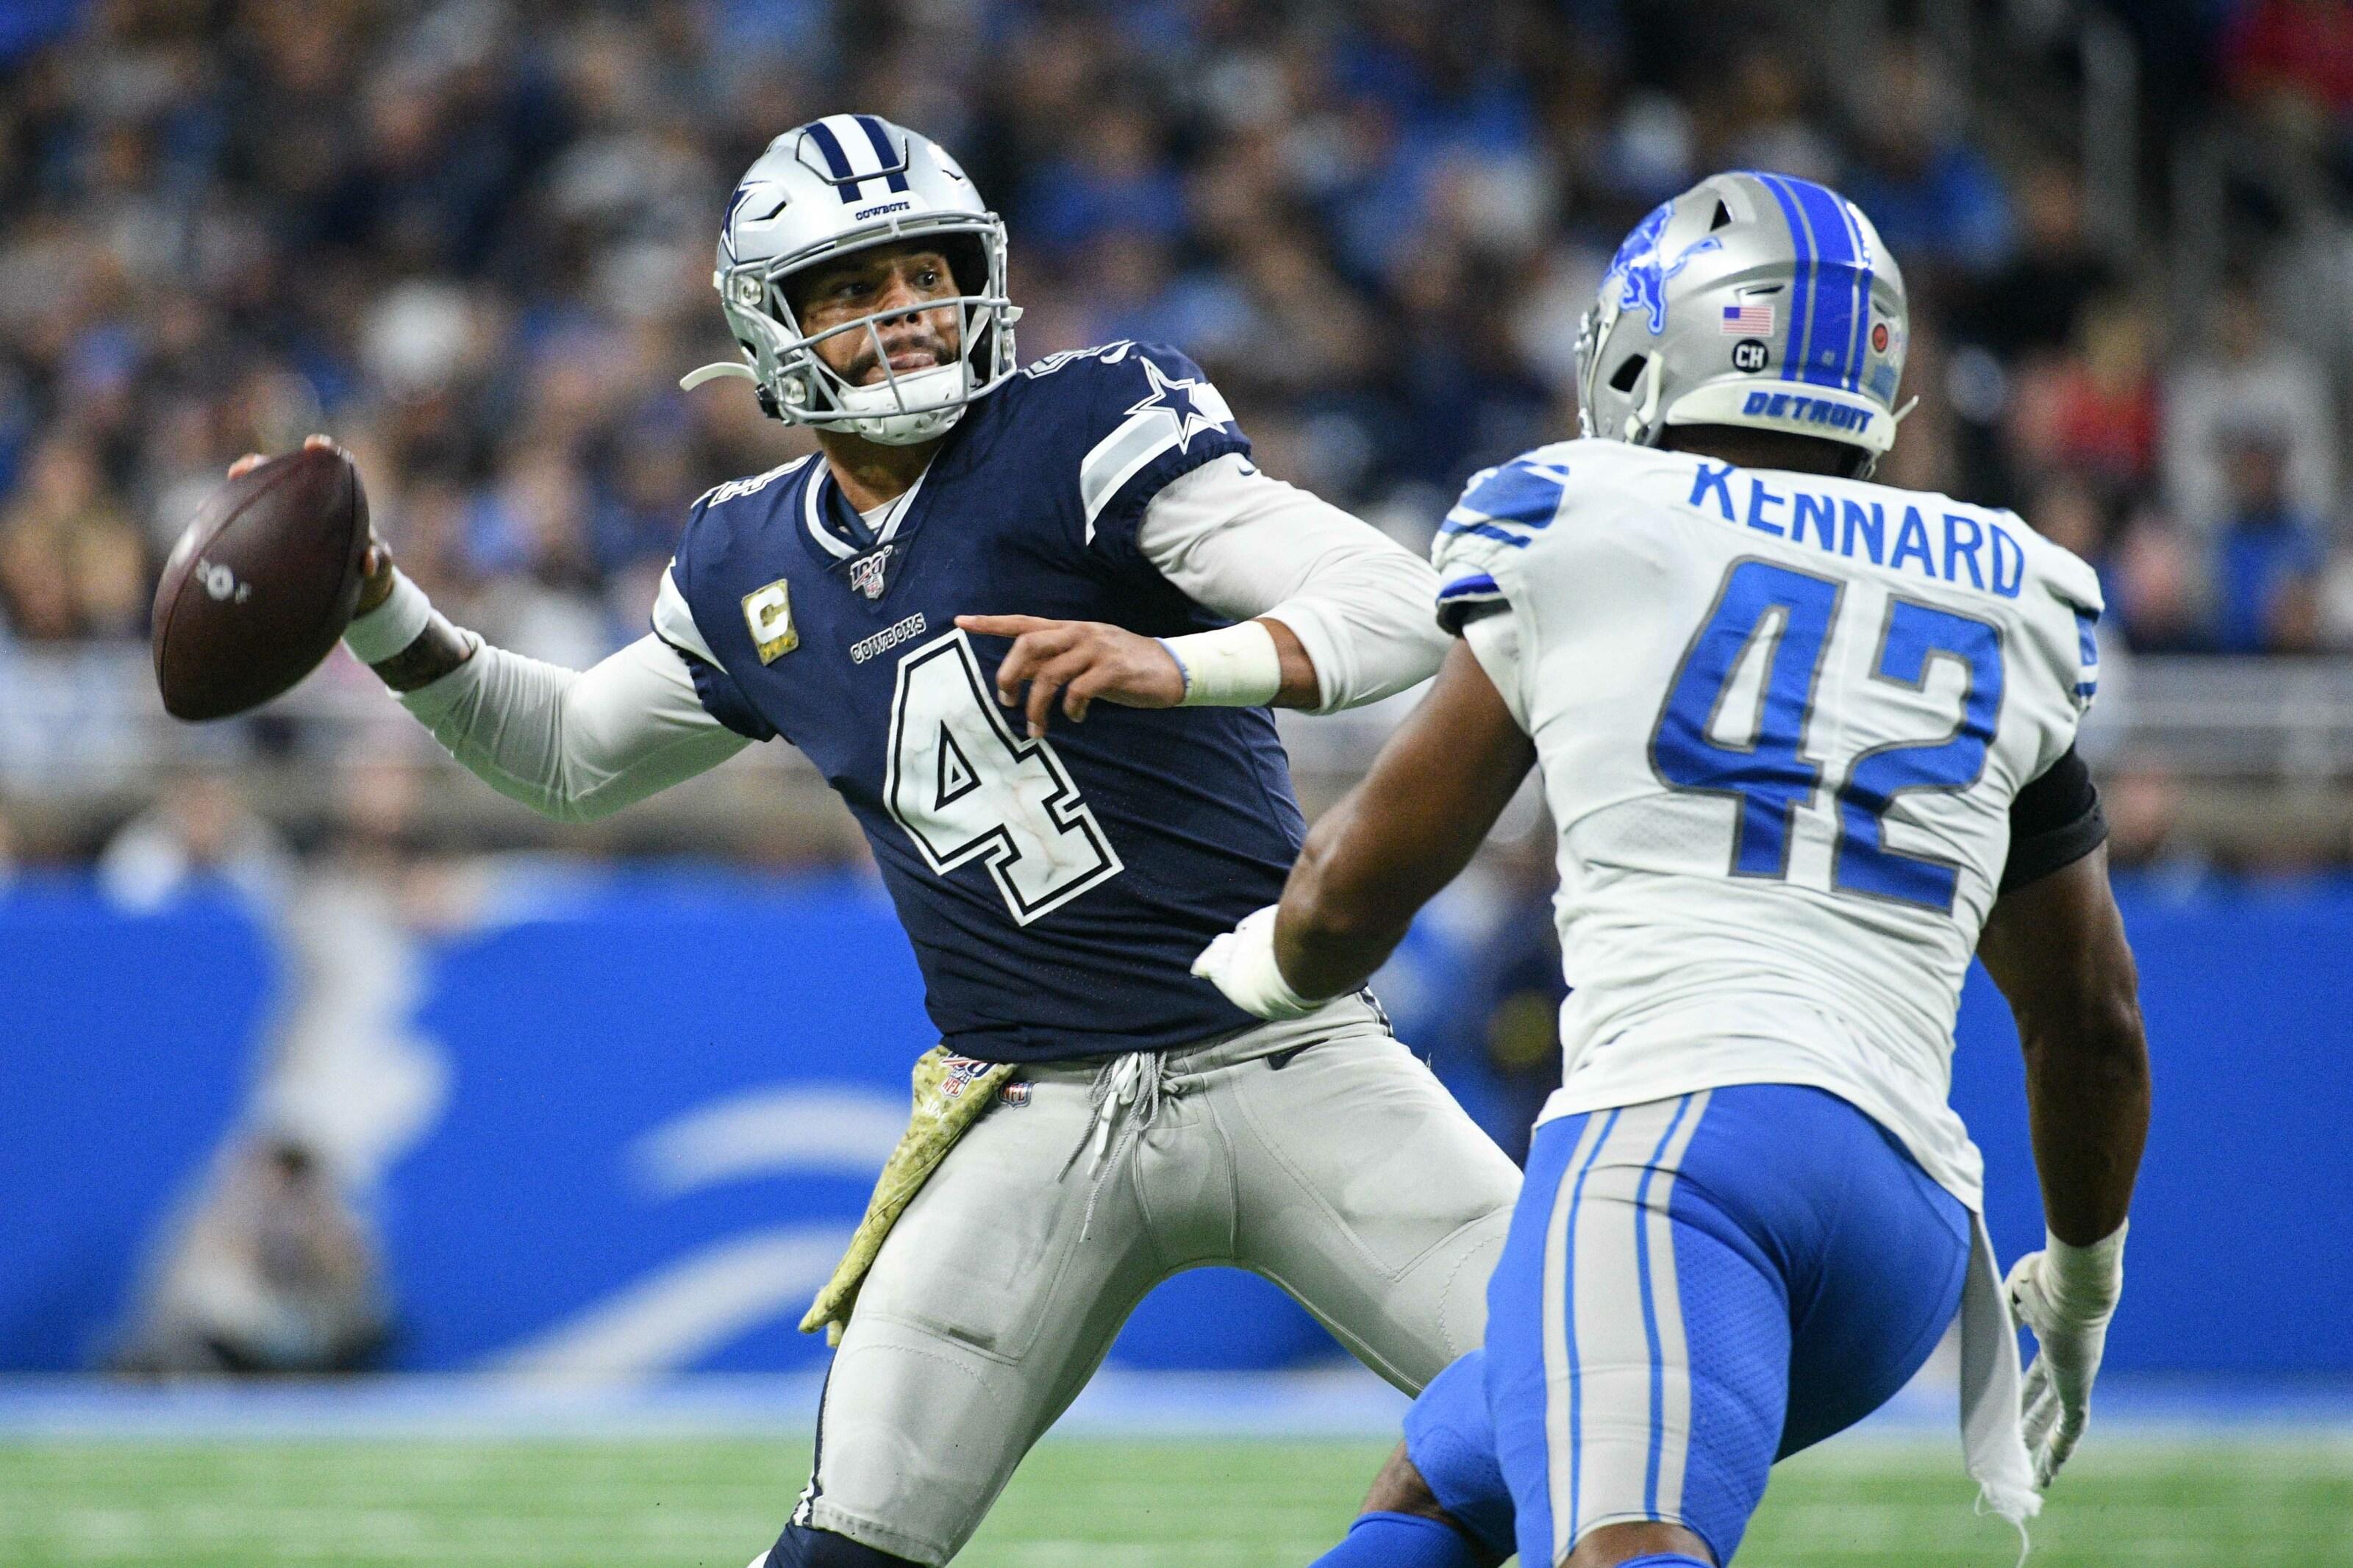 Best-bets for Sept. 9: NFL season starts; TV season is next